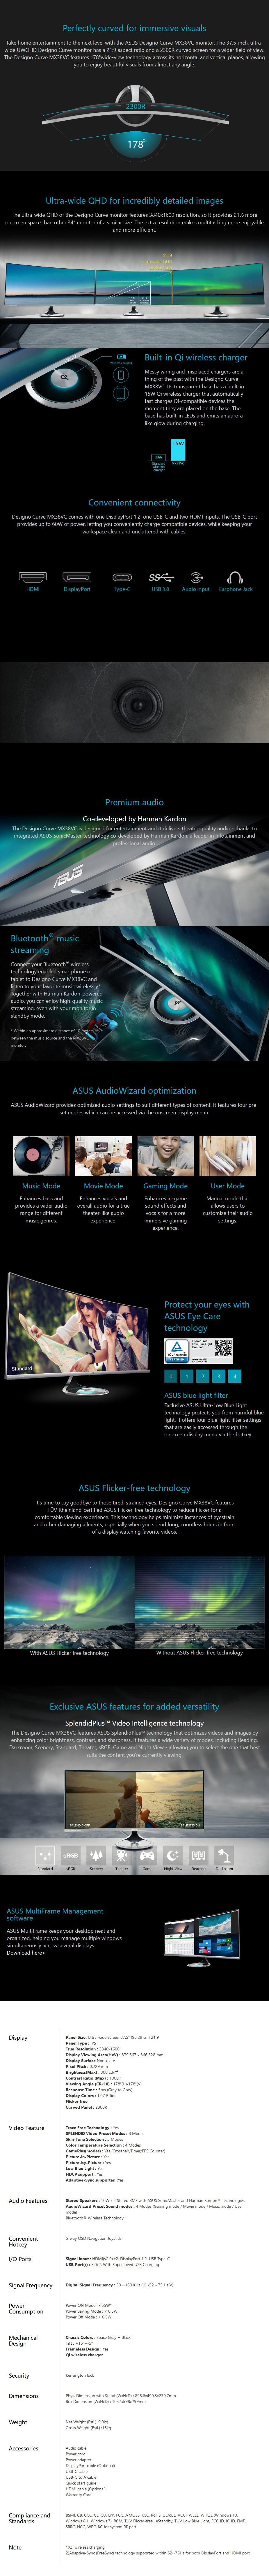 asus-designo-mx38vc-375-ultrawide-qhd-curved-ips-monitor-ac40198-10.jpg